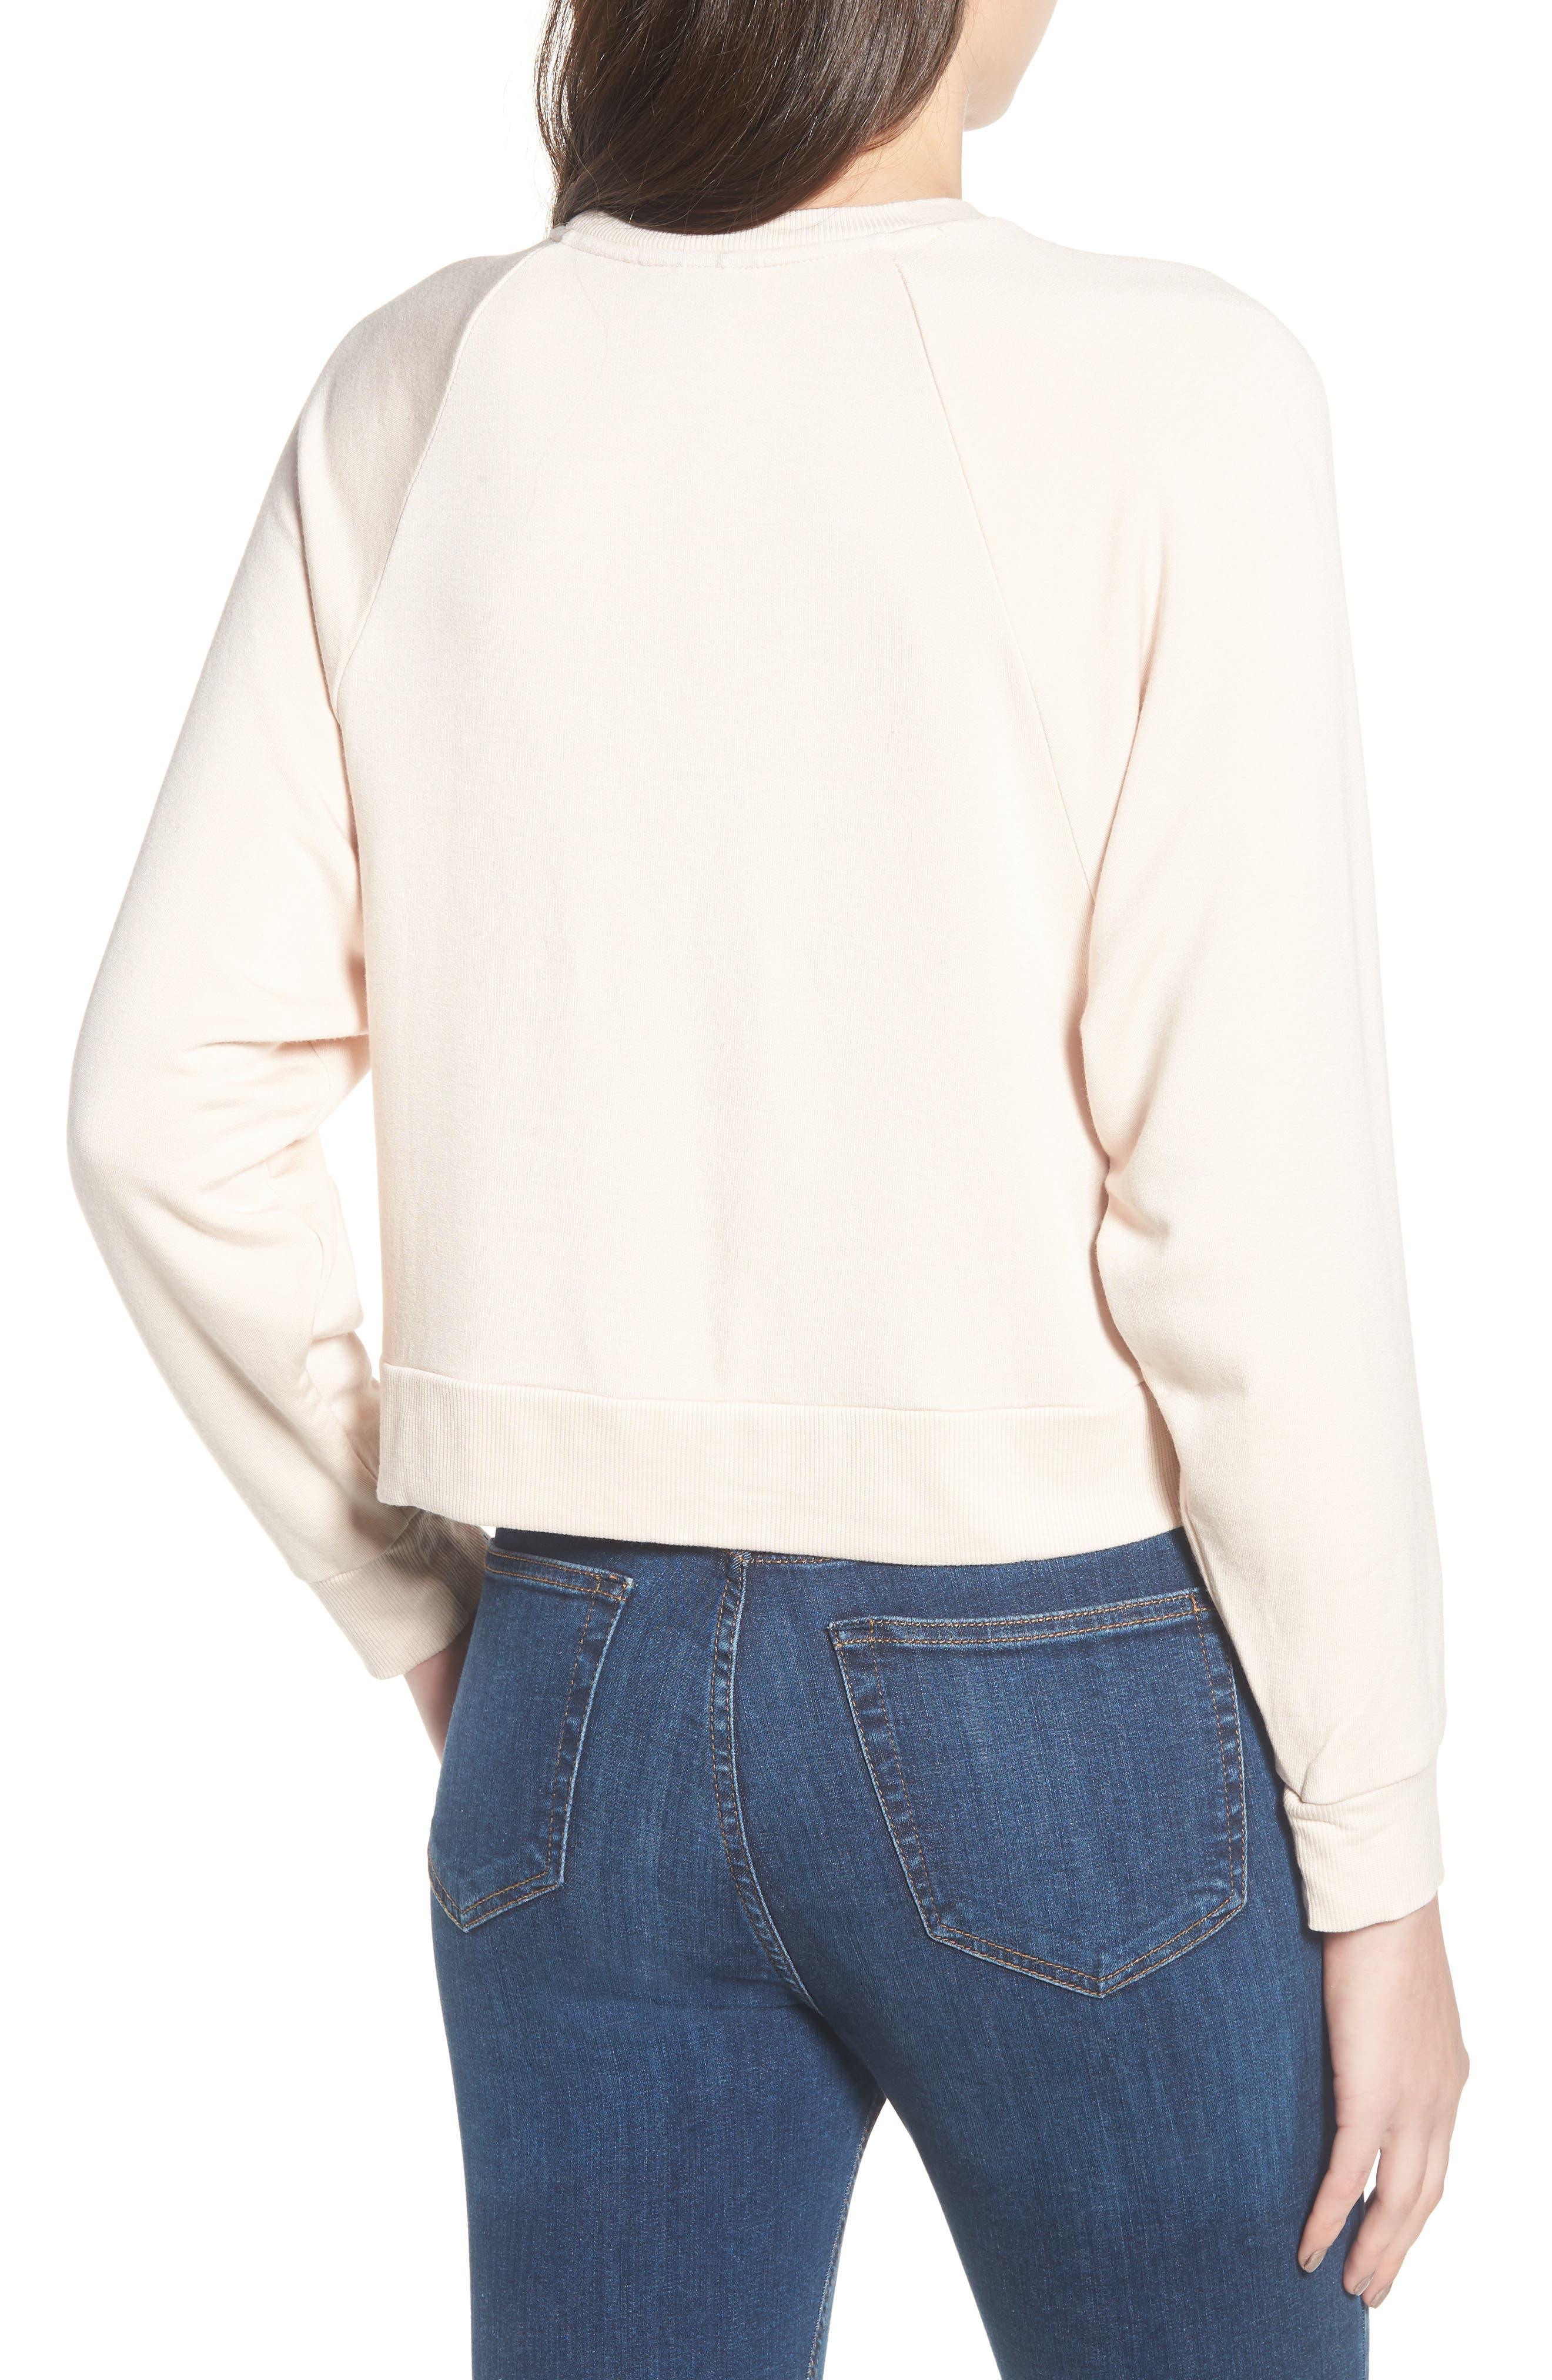 Raglan Sweatshirt,                             Alternate thumbnail 2, color,                             250